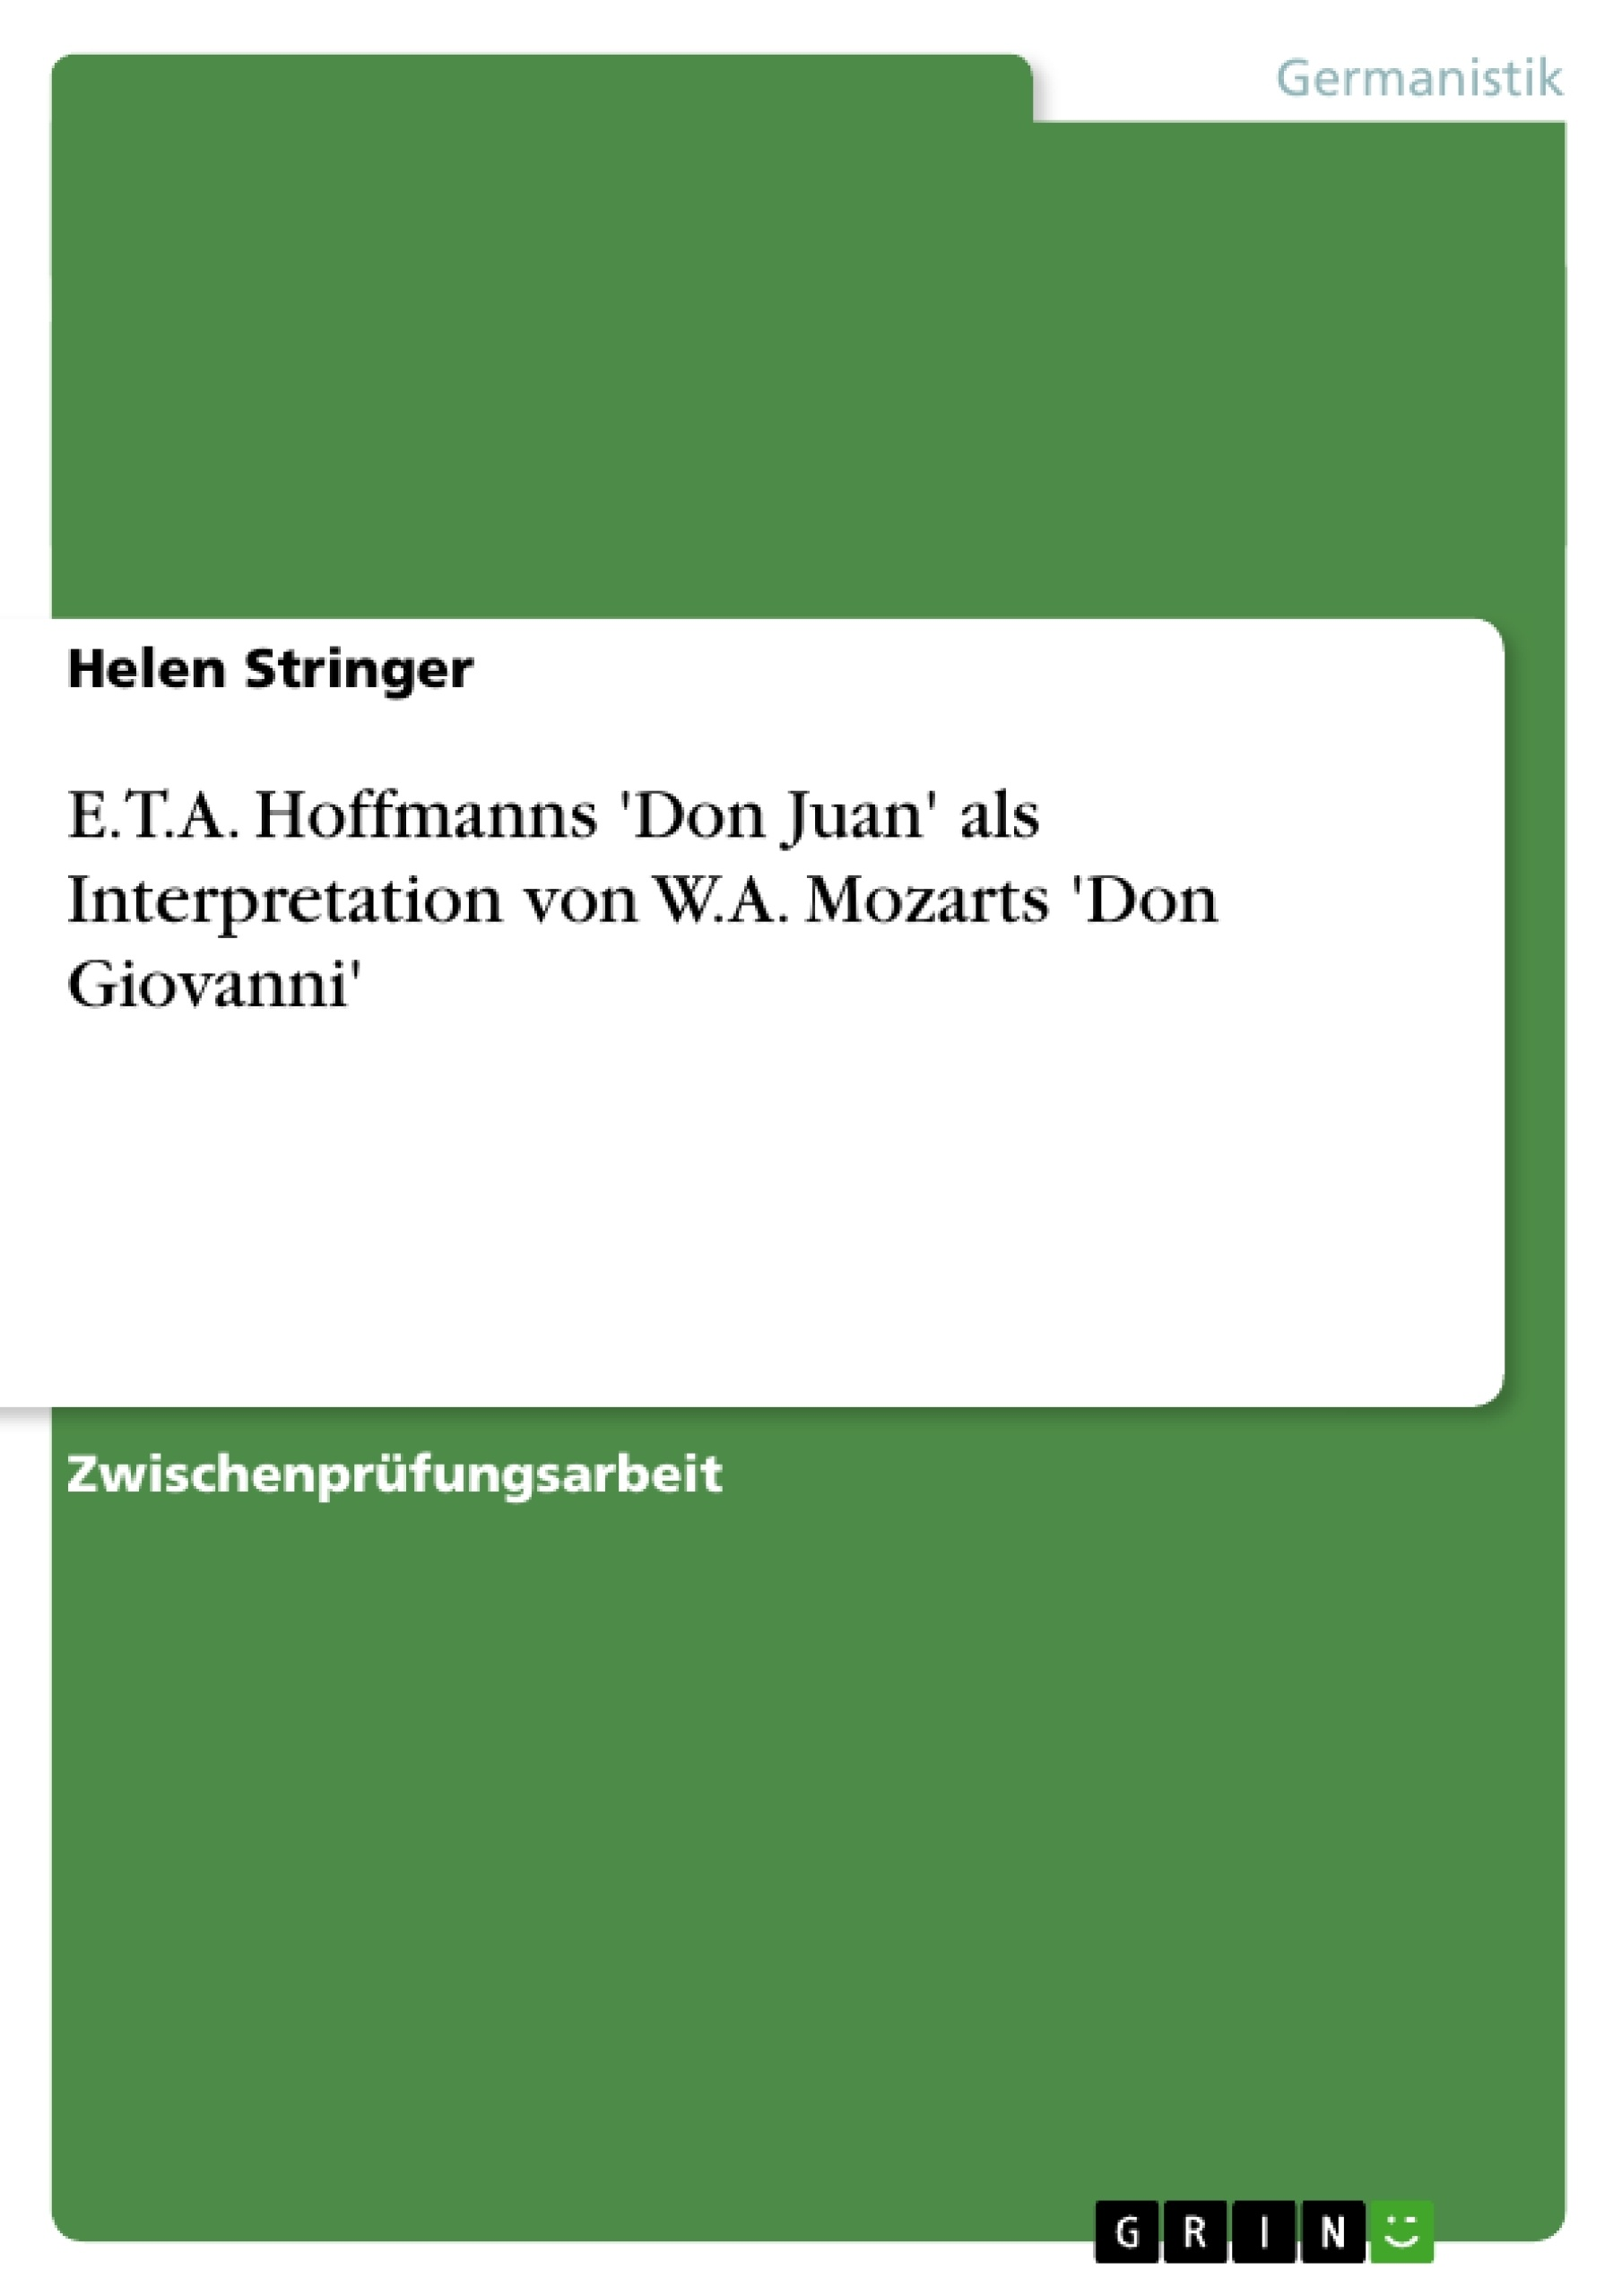 Titel: E.T.A. Hoffmanns 'Don Juan' als Interpretation von W.A. Mozarts 'Don Giovanni'